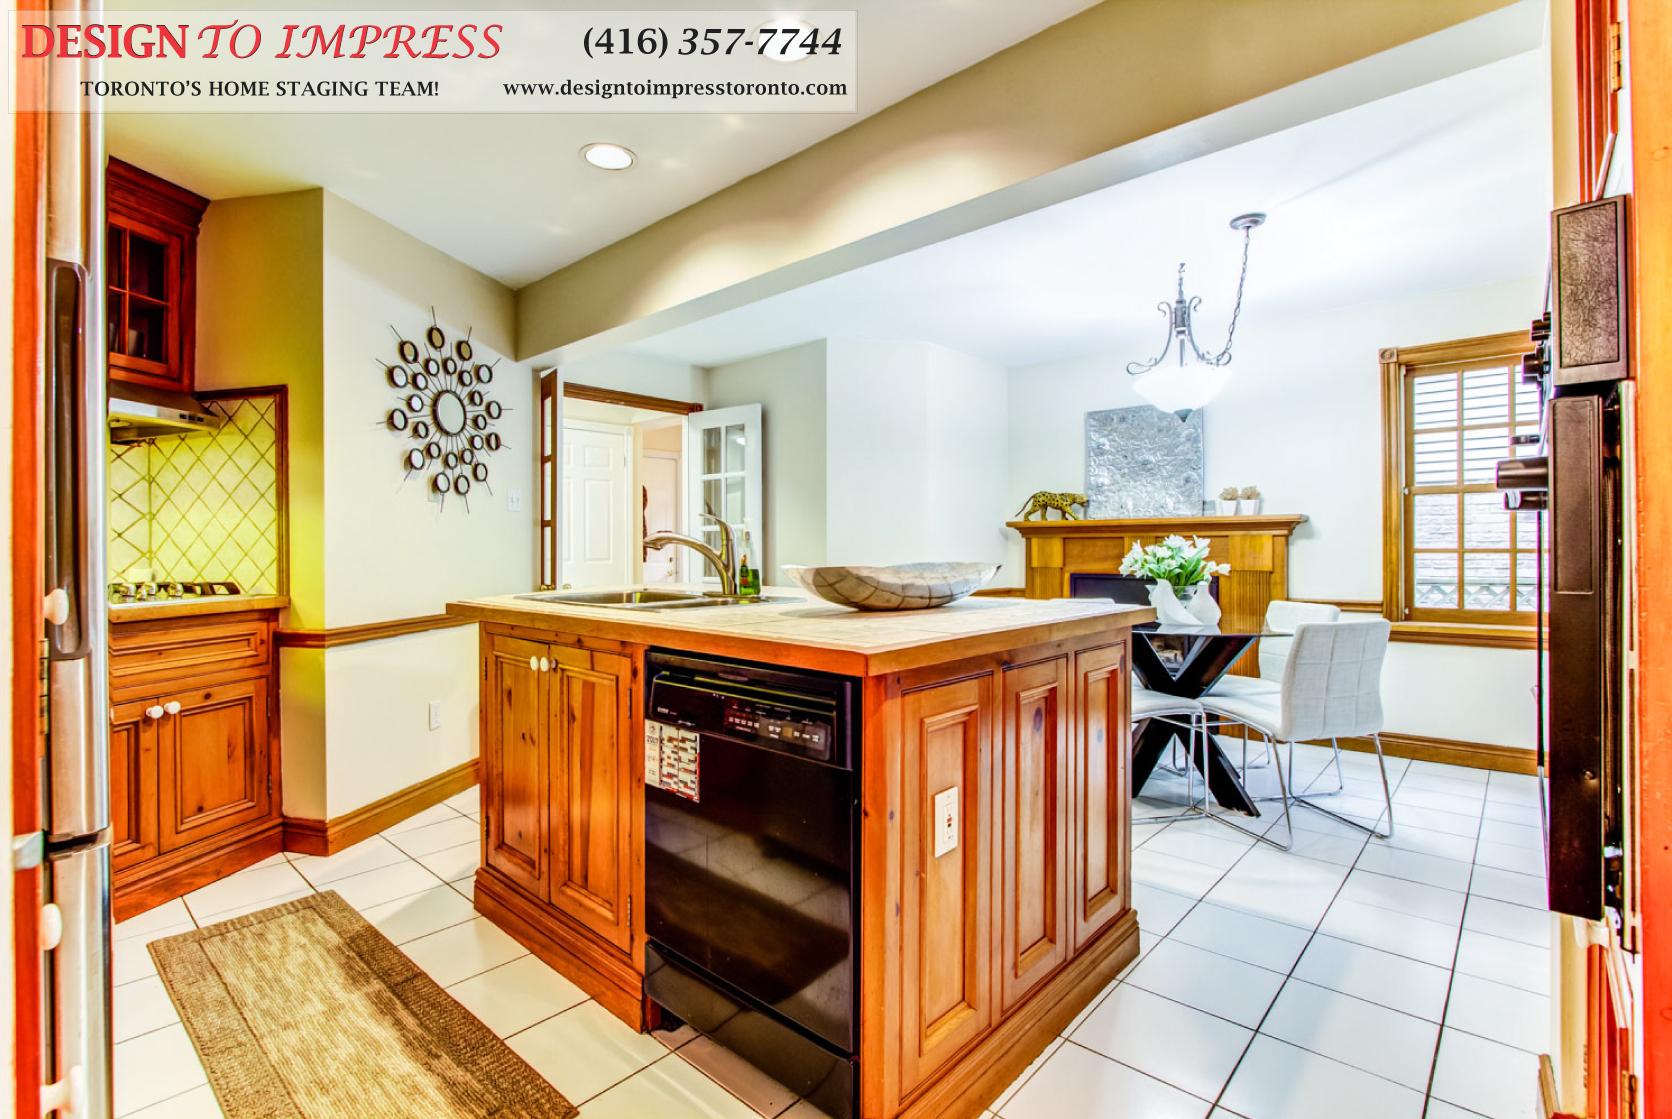 Kitchen Entrance, 133 Huntington Park, Thornhill Home Staging